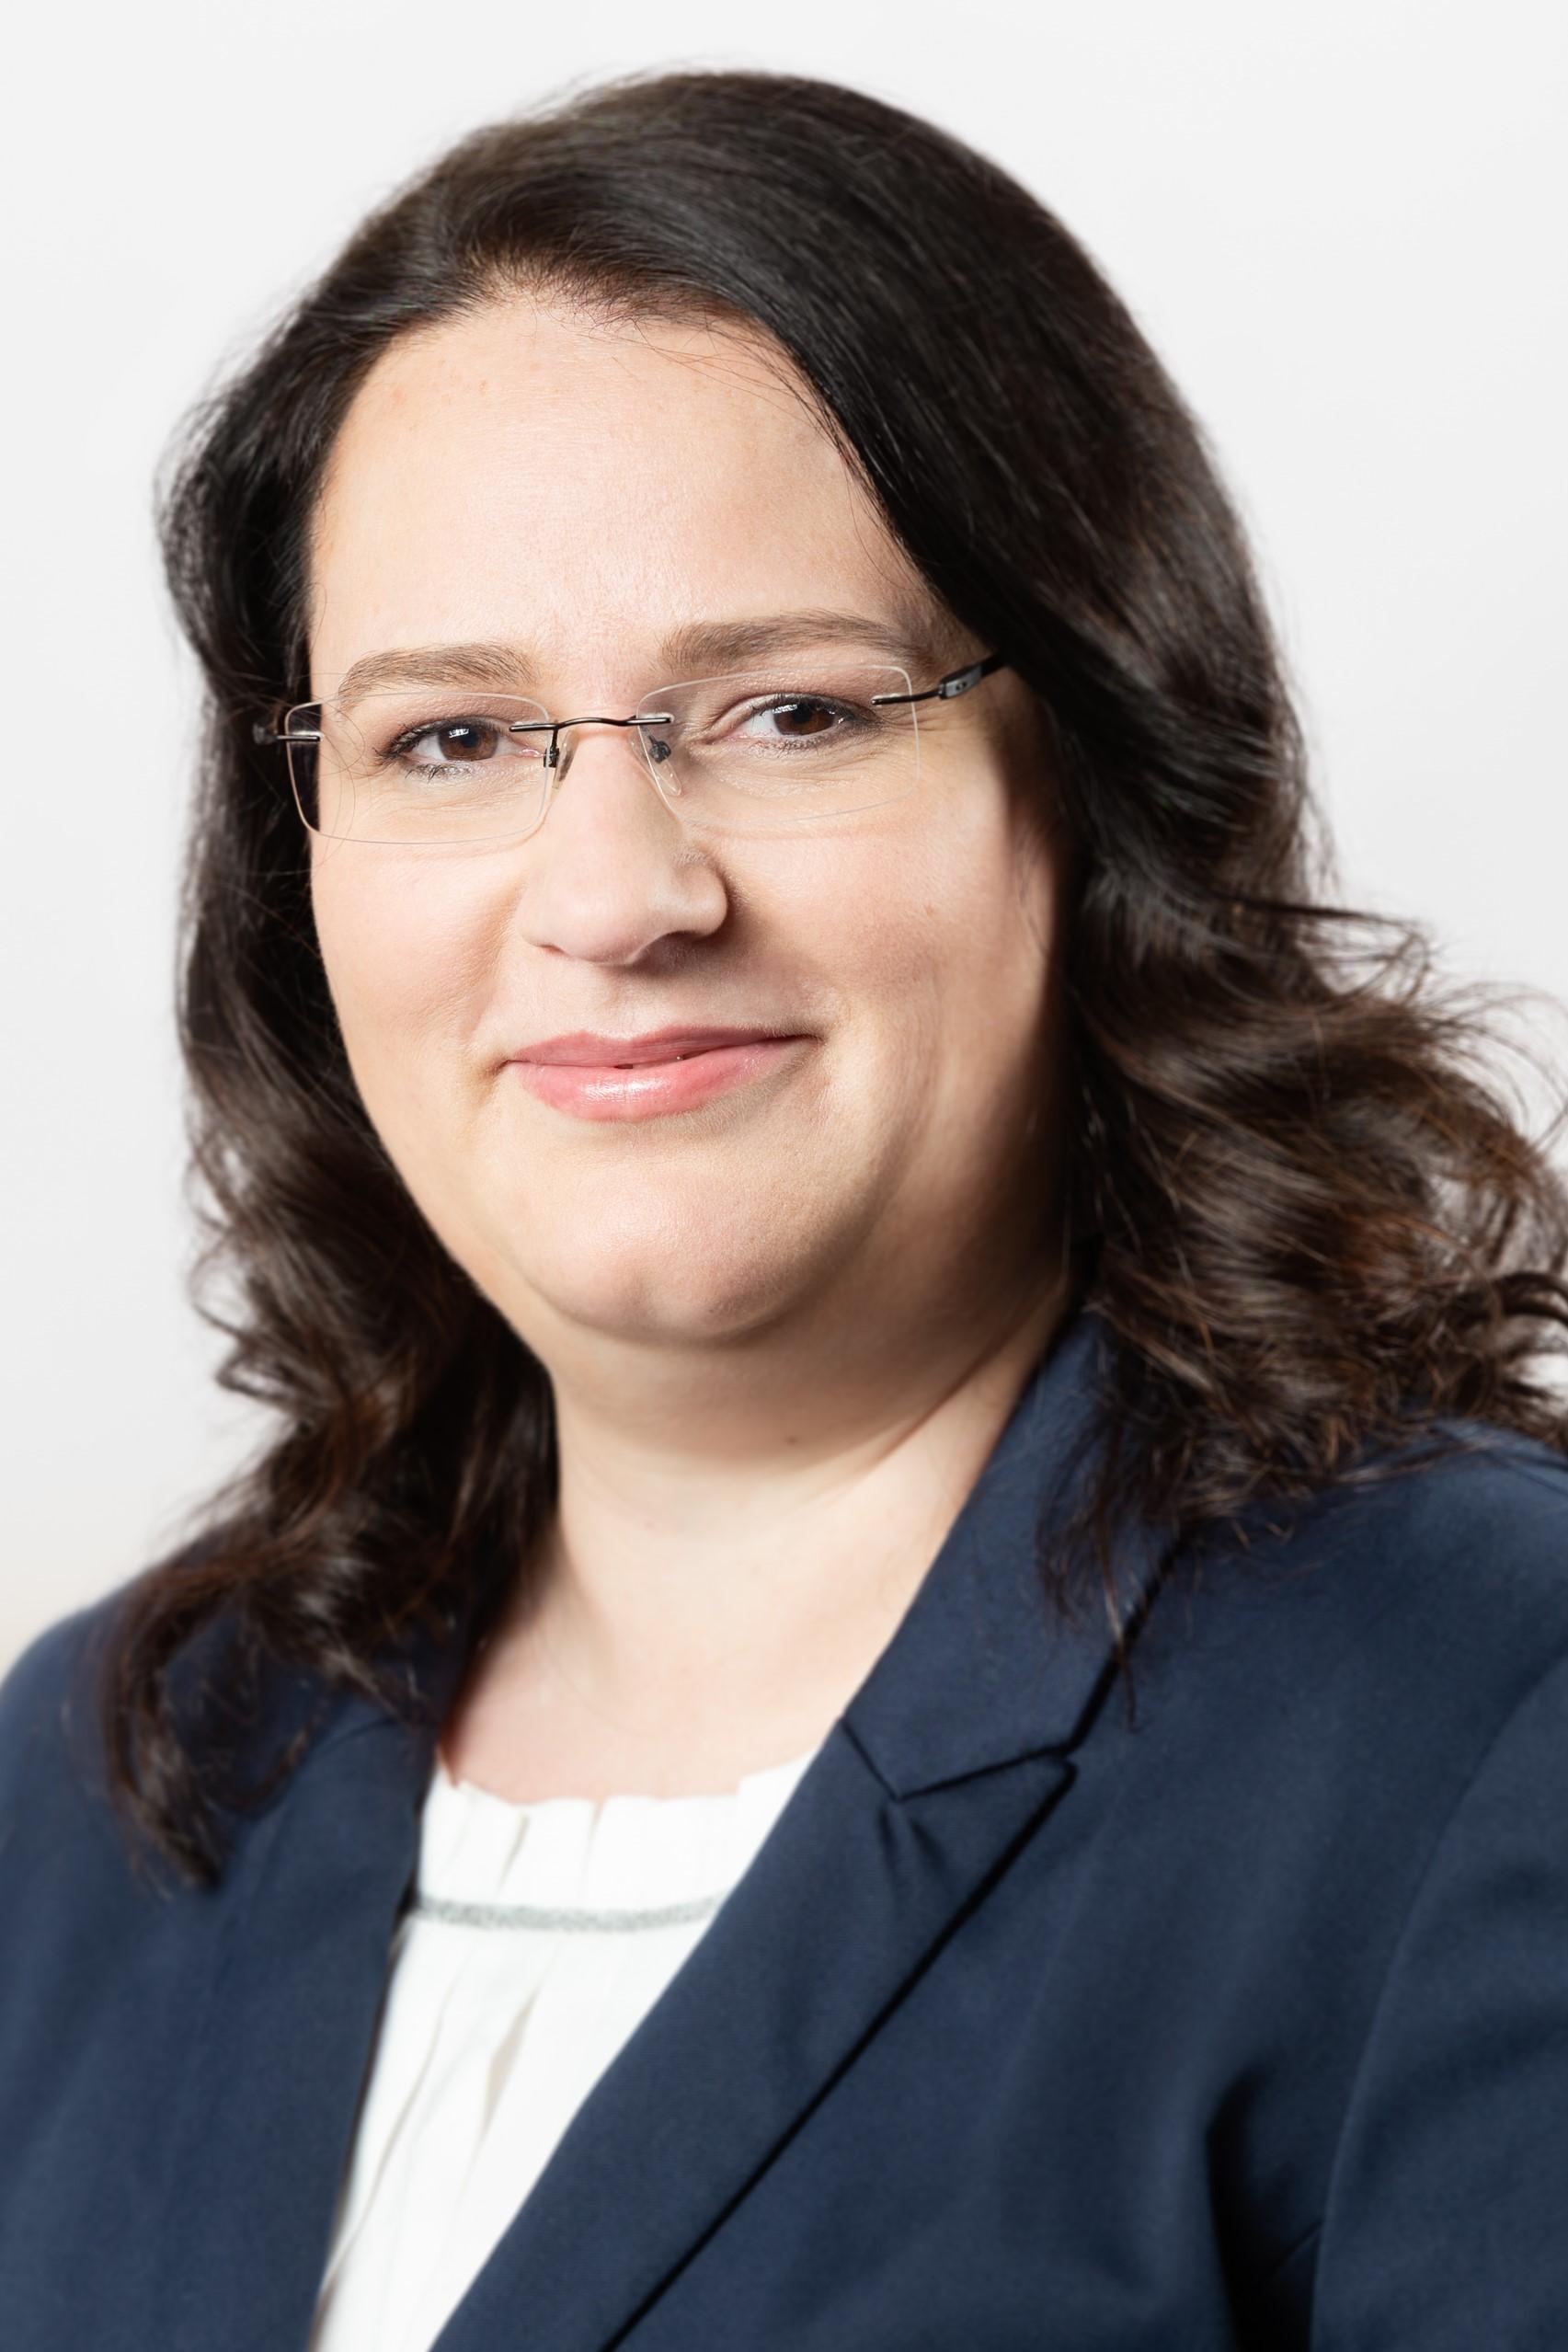 Inés Atug